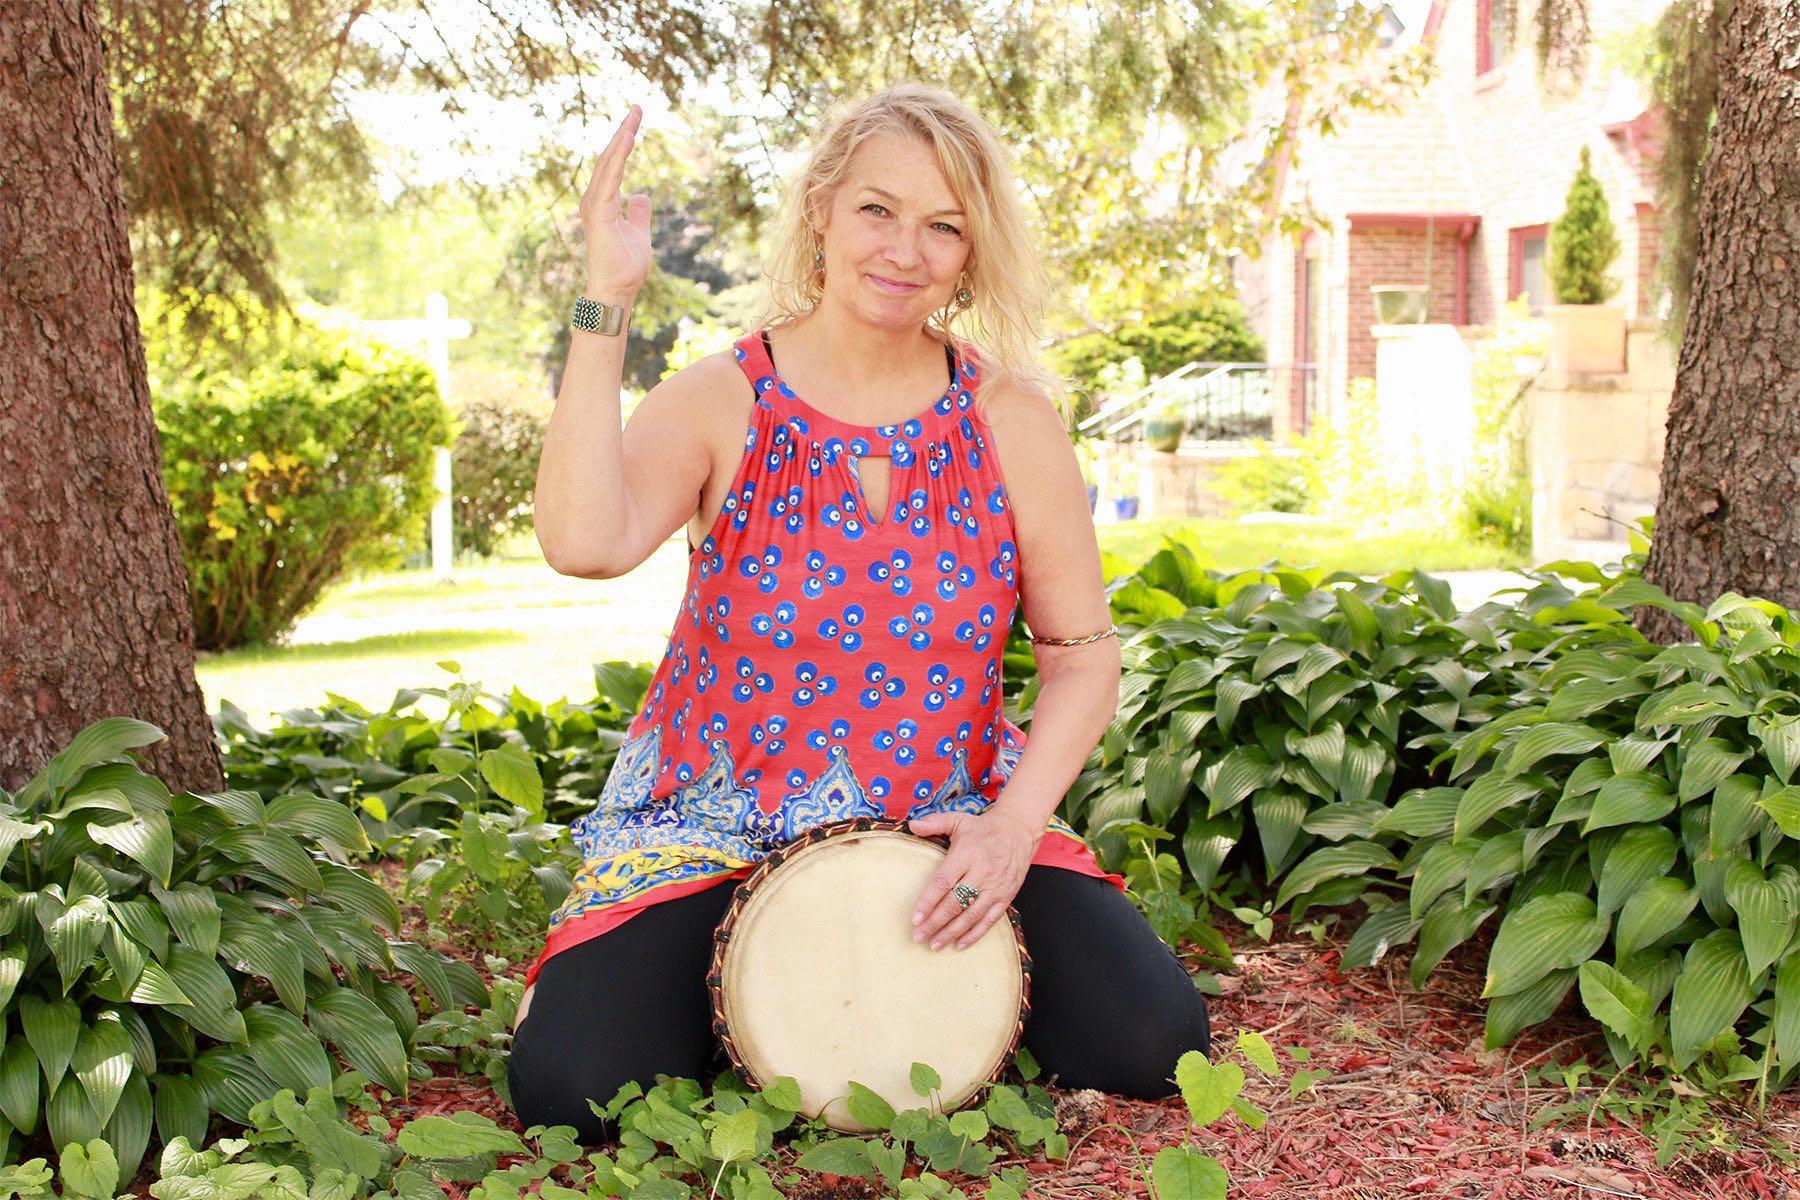 Tara Cindy Sherman playing a Djembe drum in her garden.